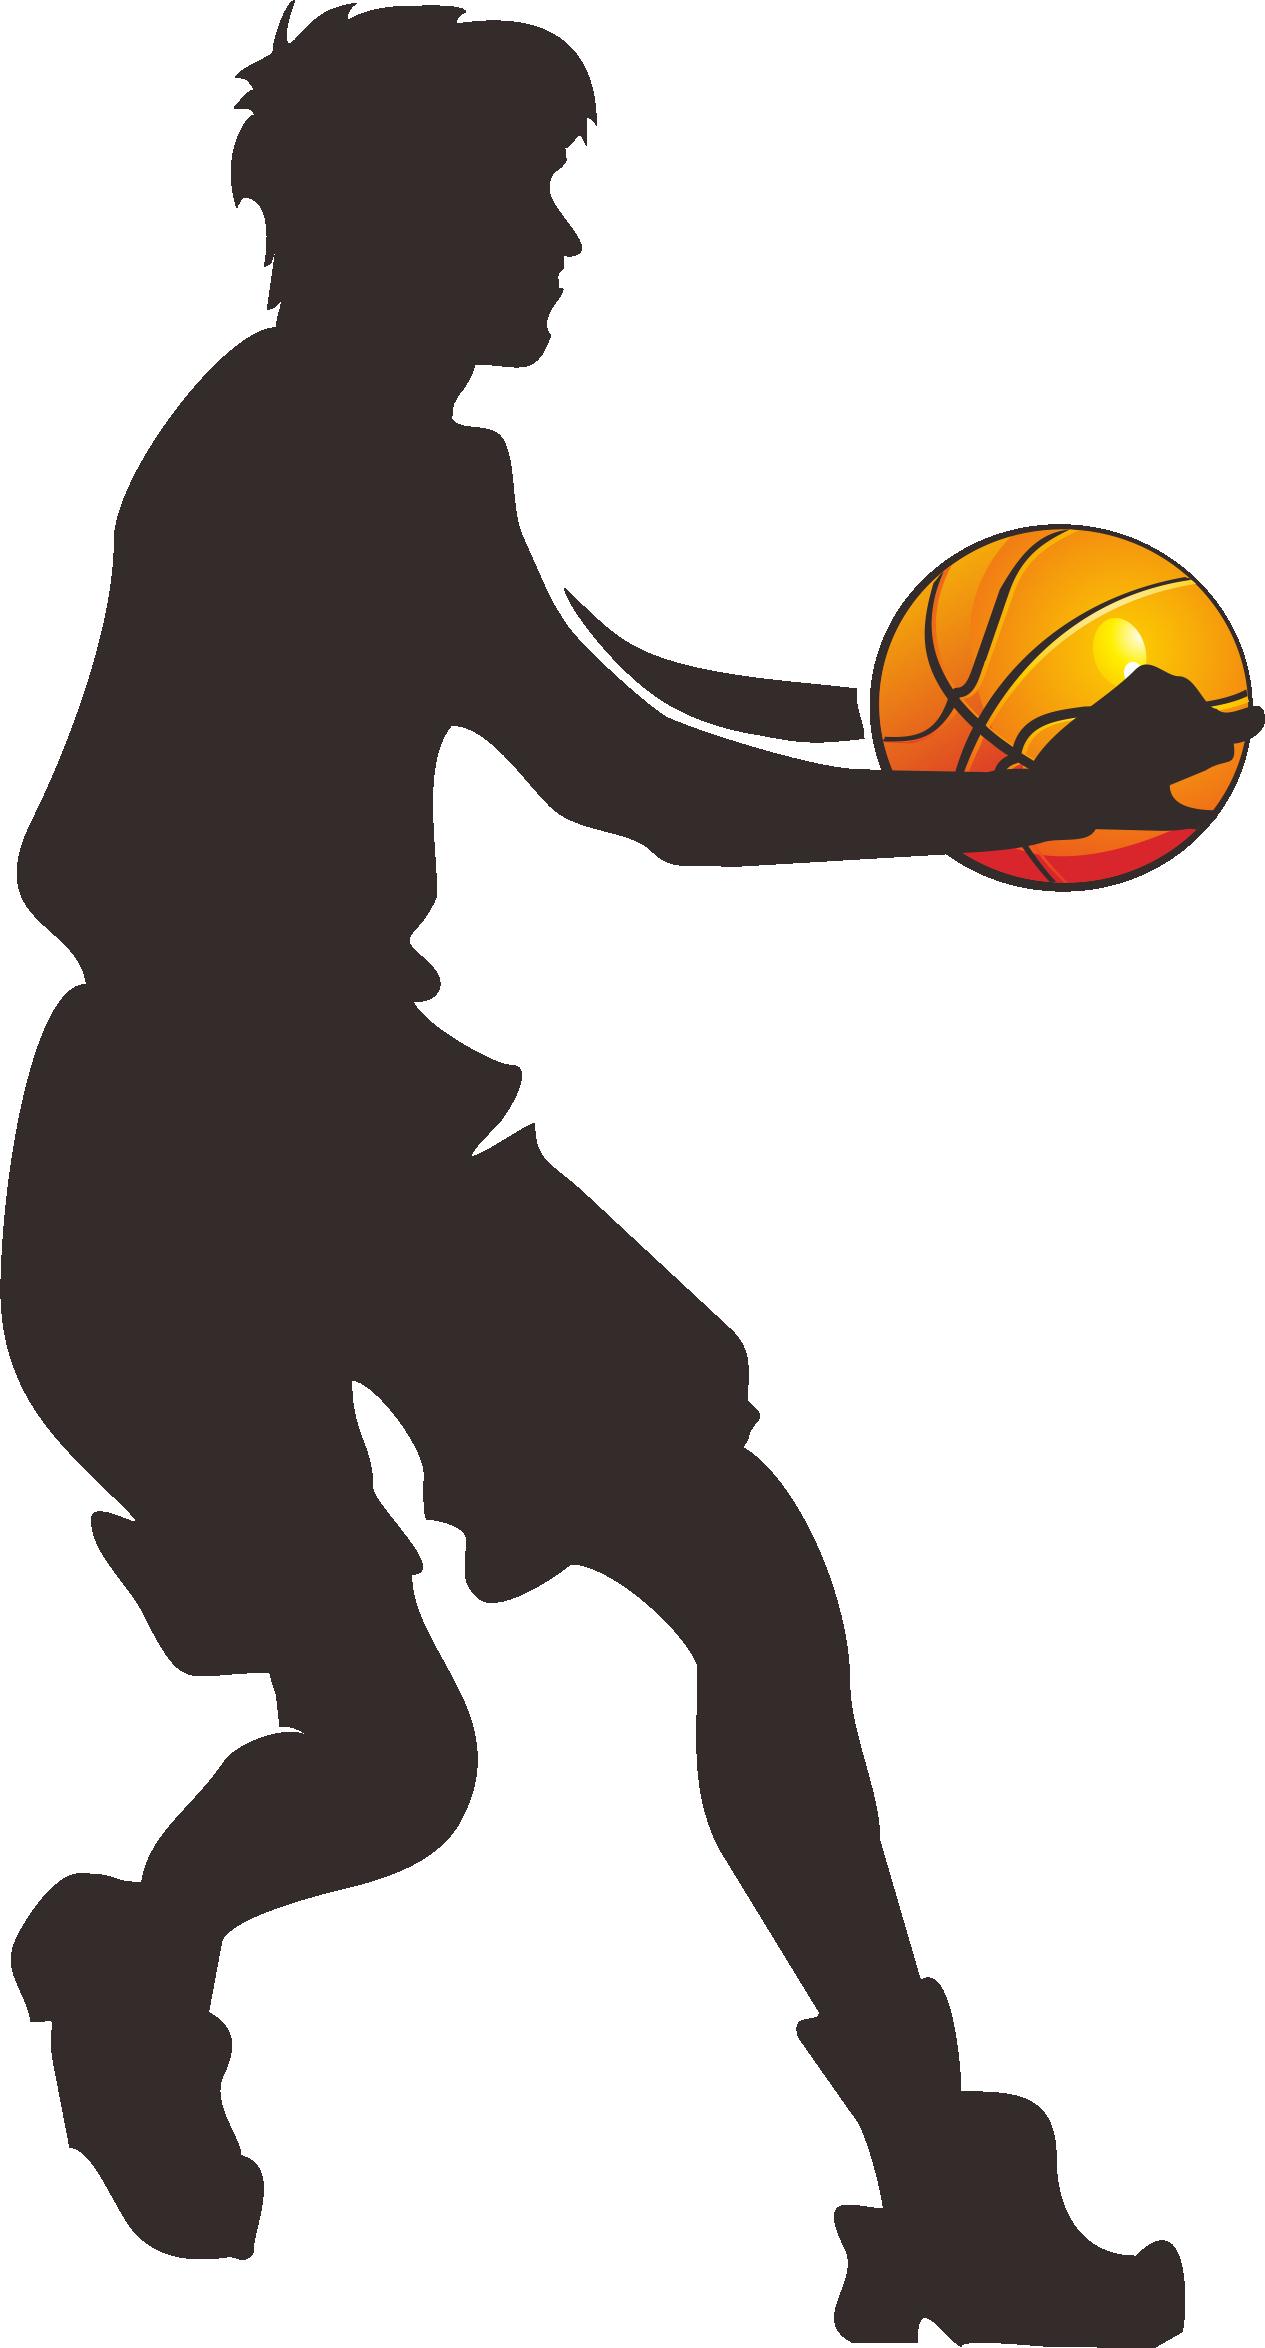 Basketball dunk clipart png black and white library Basketball Backboard Slam dunk Clip art - basketball 1265*2348 ... png black and white library